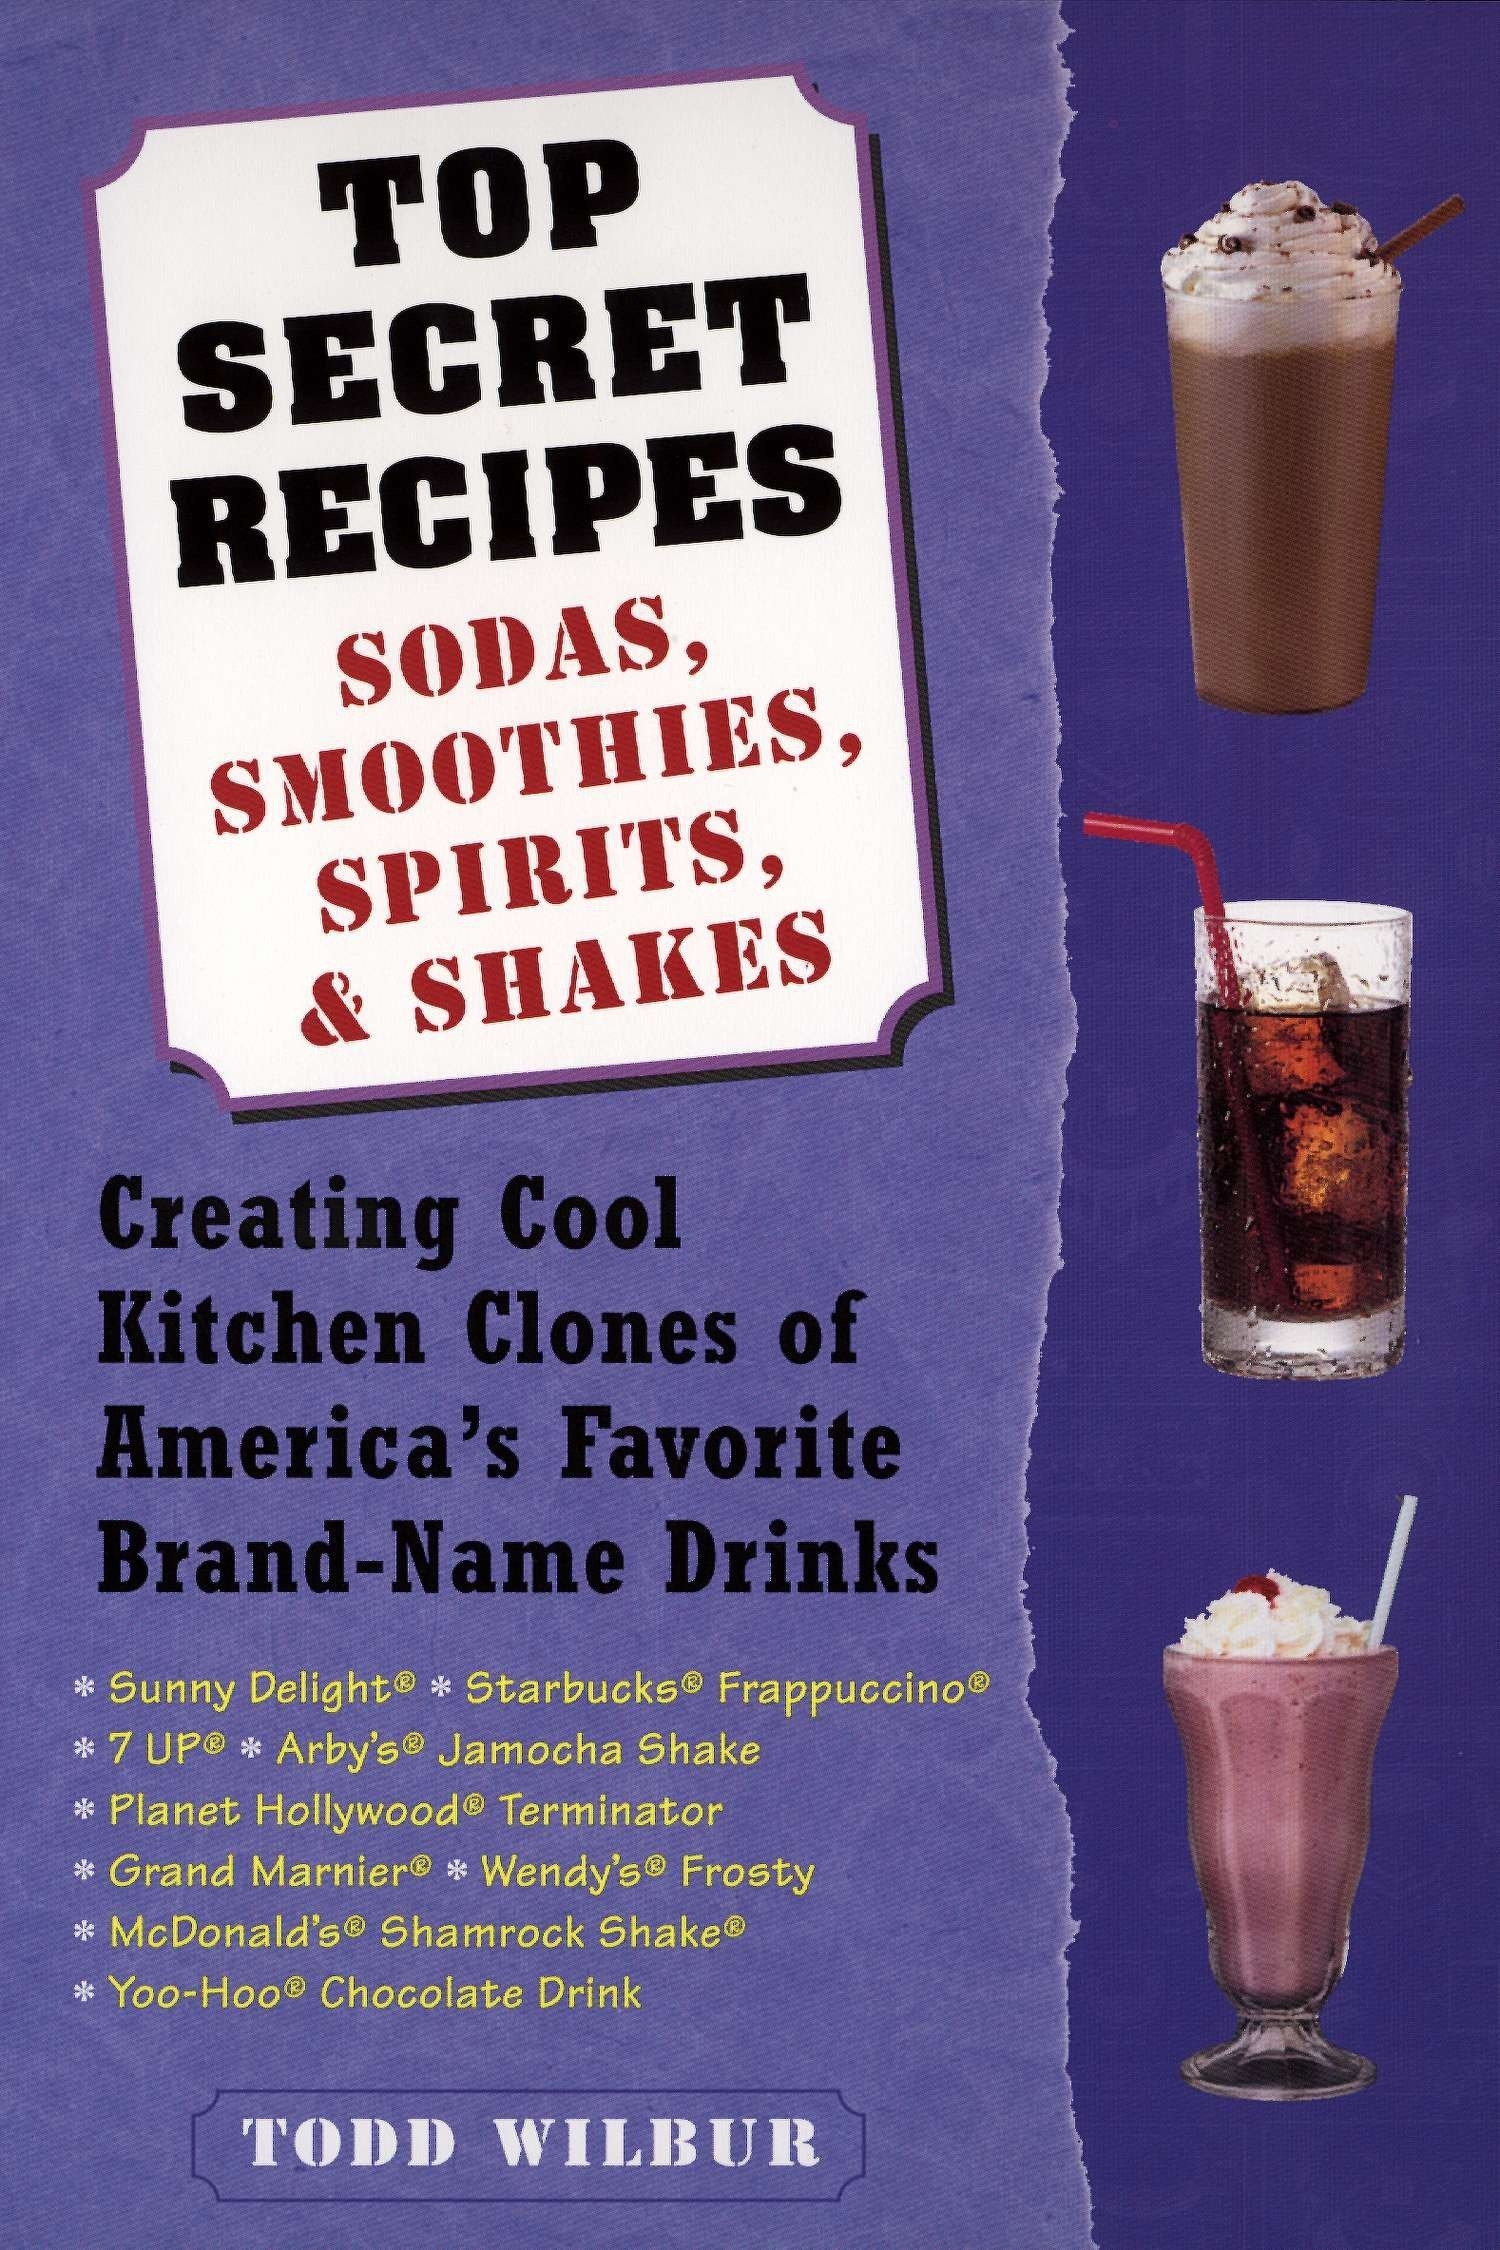 Top Secret Recipes--Sodas, Smoothies, Spirits, & Shakes: Creating Cool Kitchen Clones of America's Favorite Brand-Name Drinks pdf epub